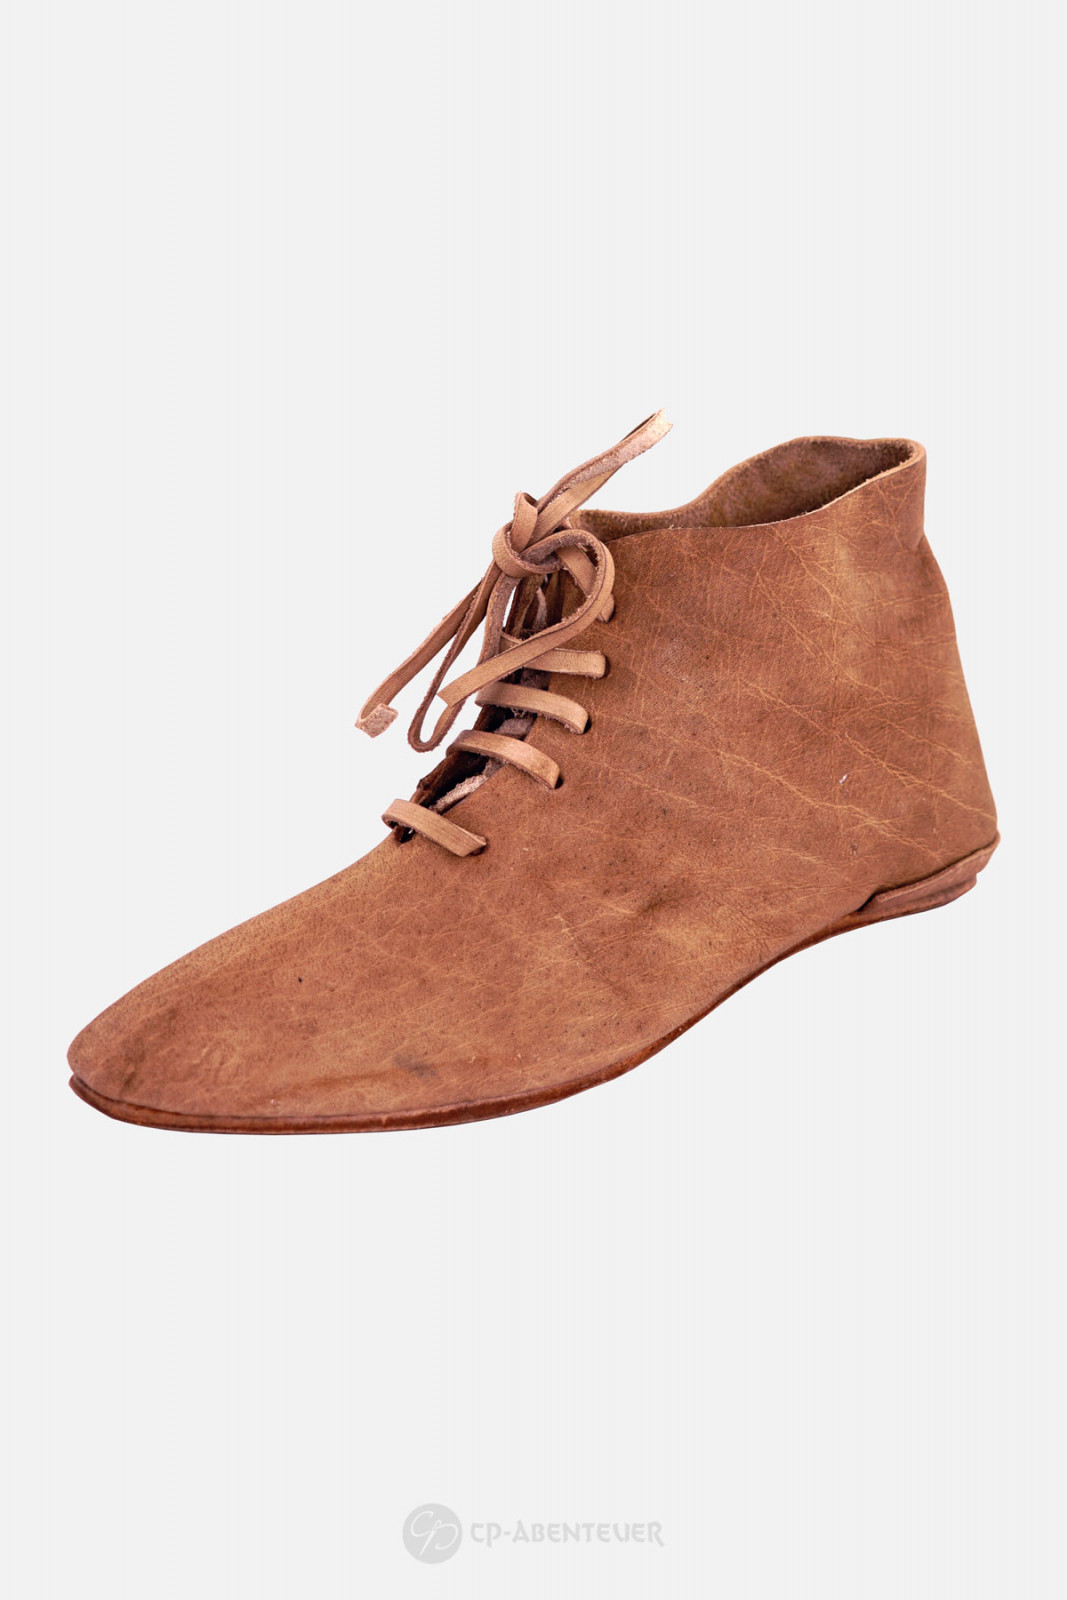 Ewalt - Schuhe